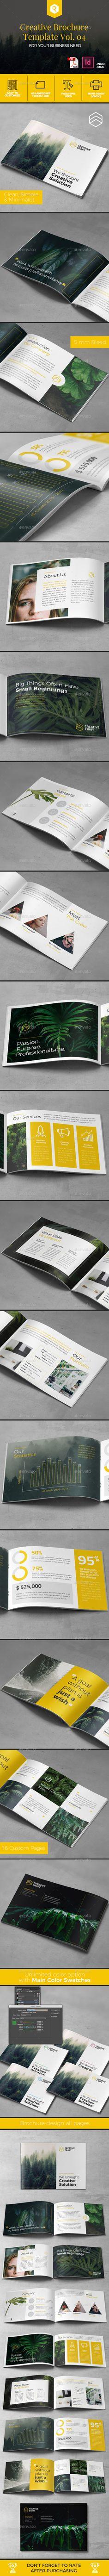 A5 Creative Brochure Template Vol. 04